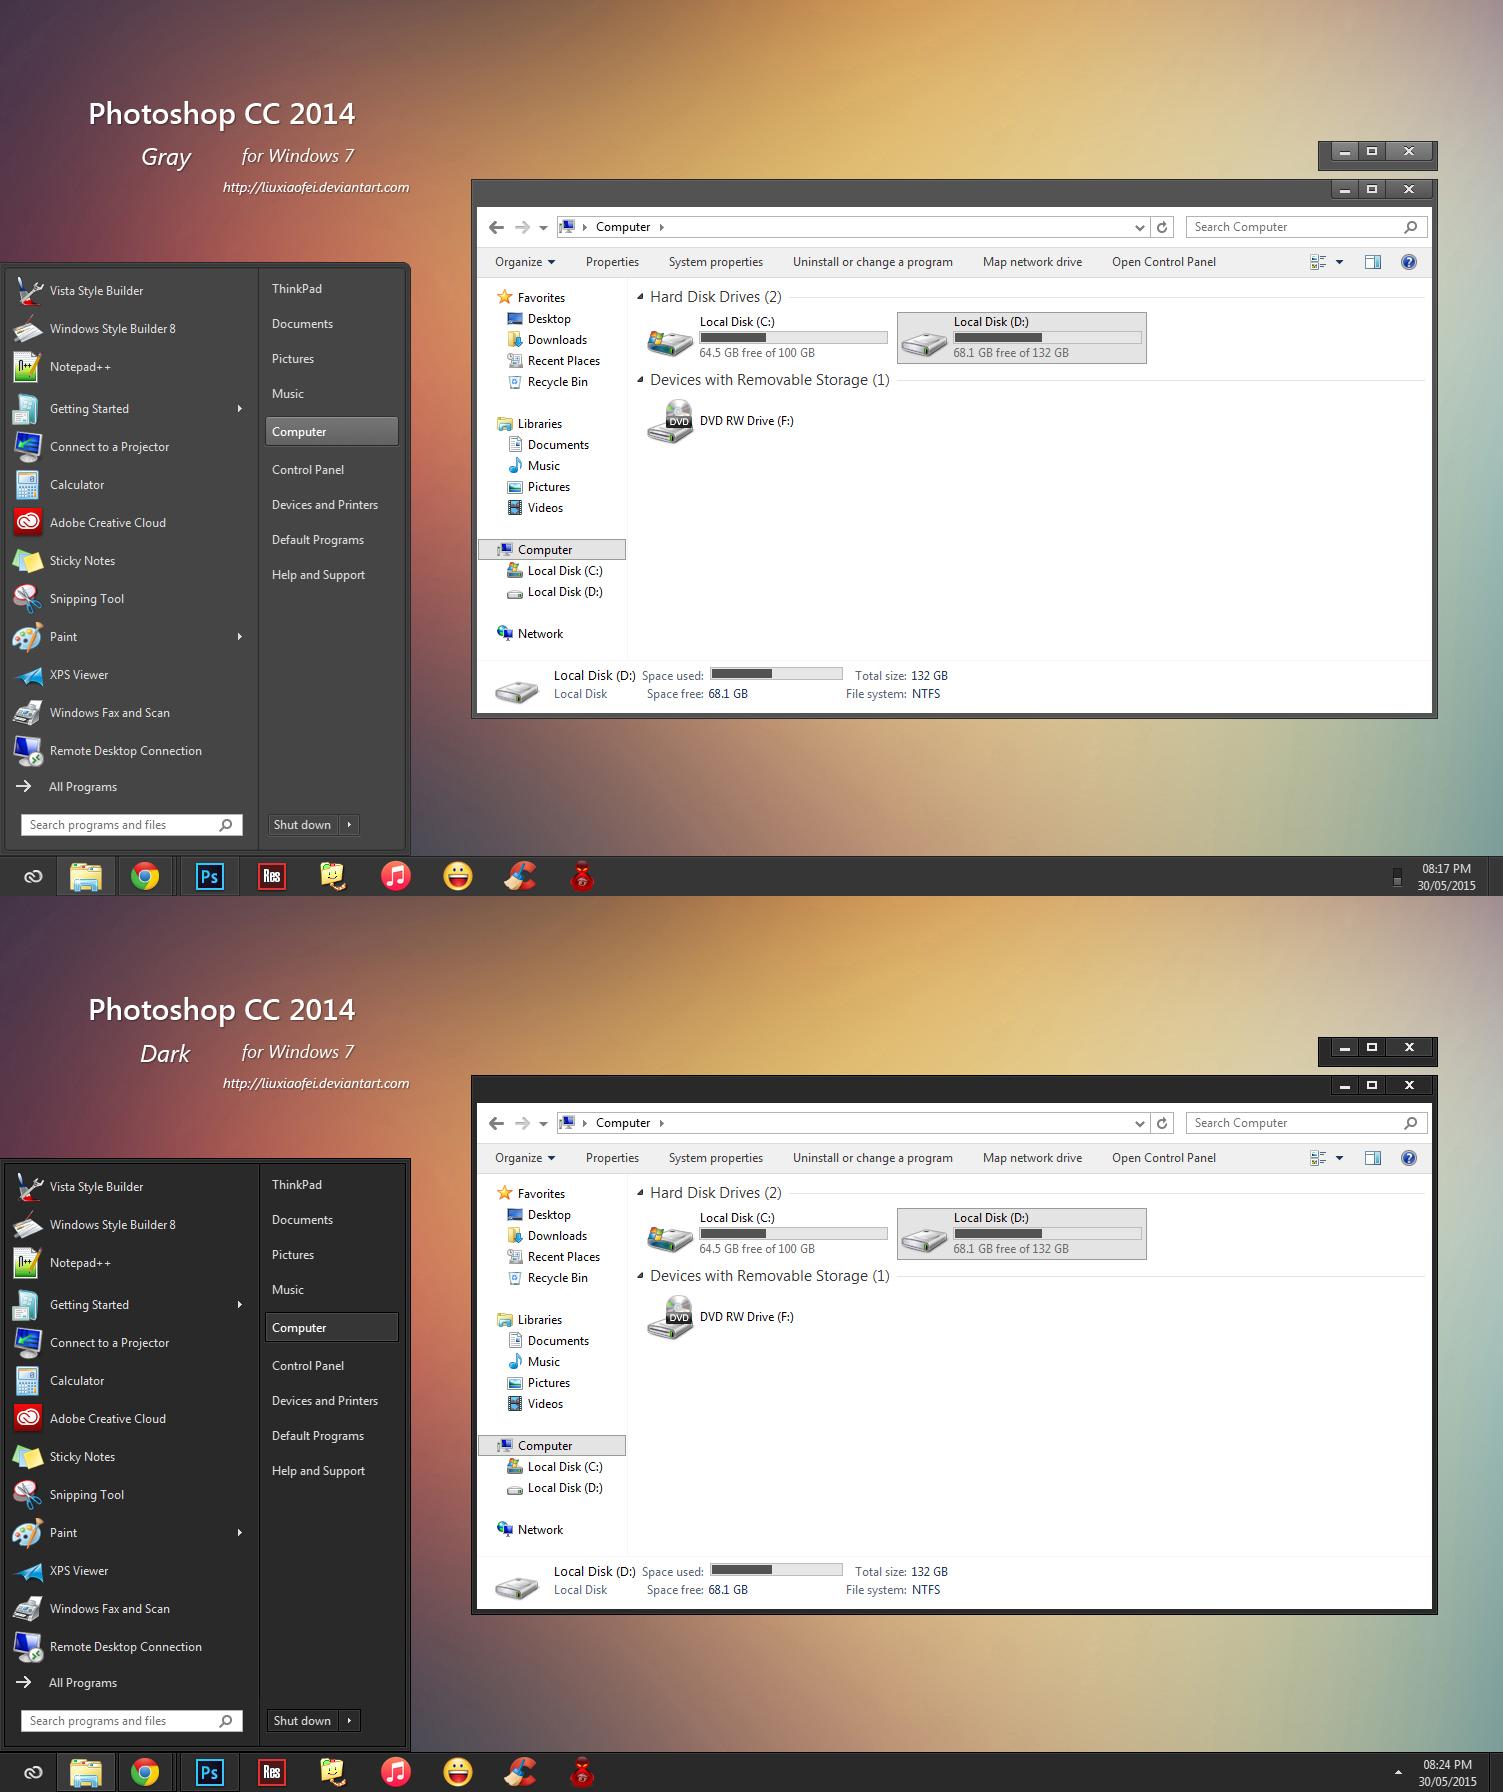 Photoshop CC 2014 VS for Windows 7 by Liuxiaofei